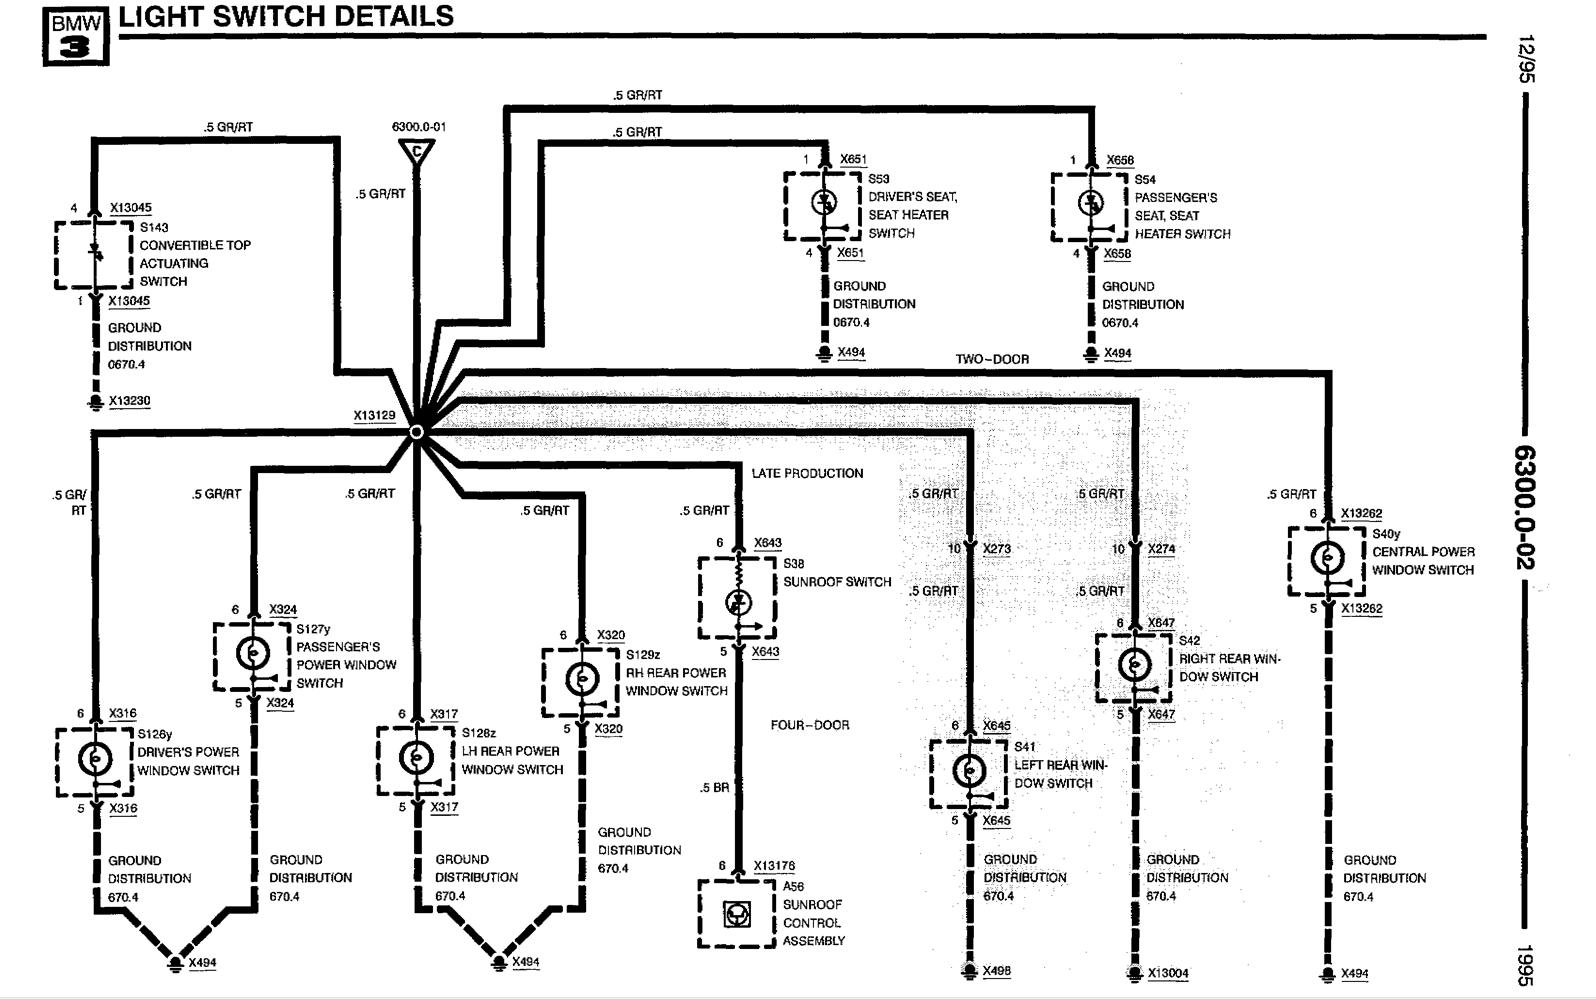 bmw wiring diagram e36 wiring diagram third level bmw e38 radio wiring diagram 98 e36 wiring [ 1596 x 999 Pixel ]